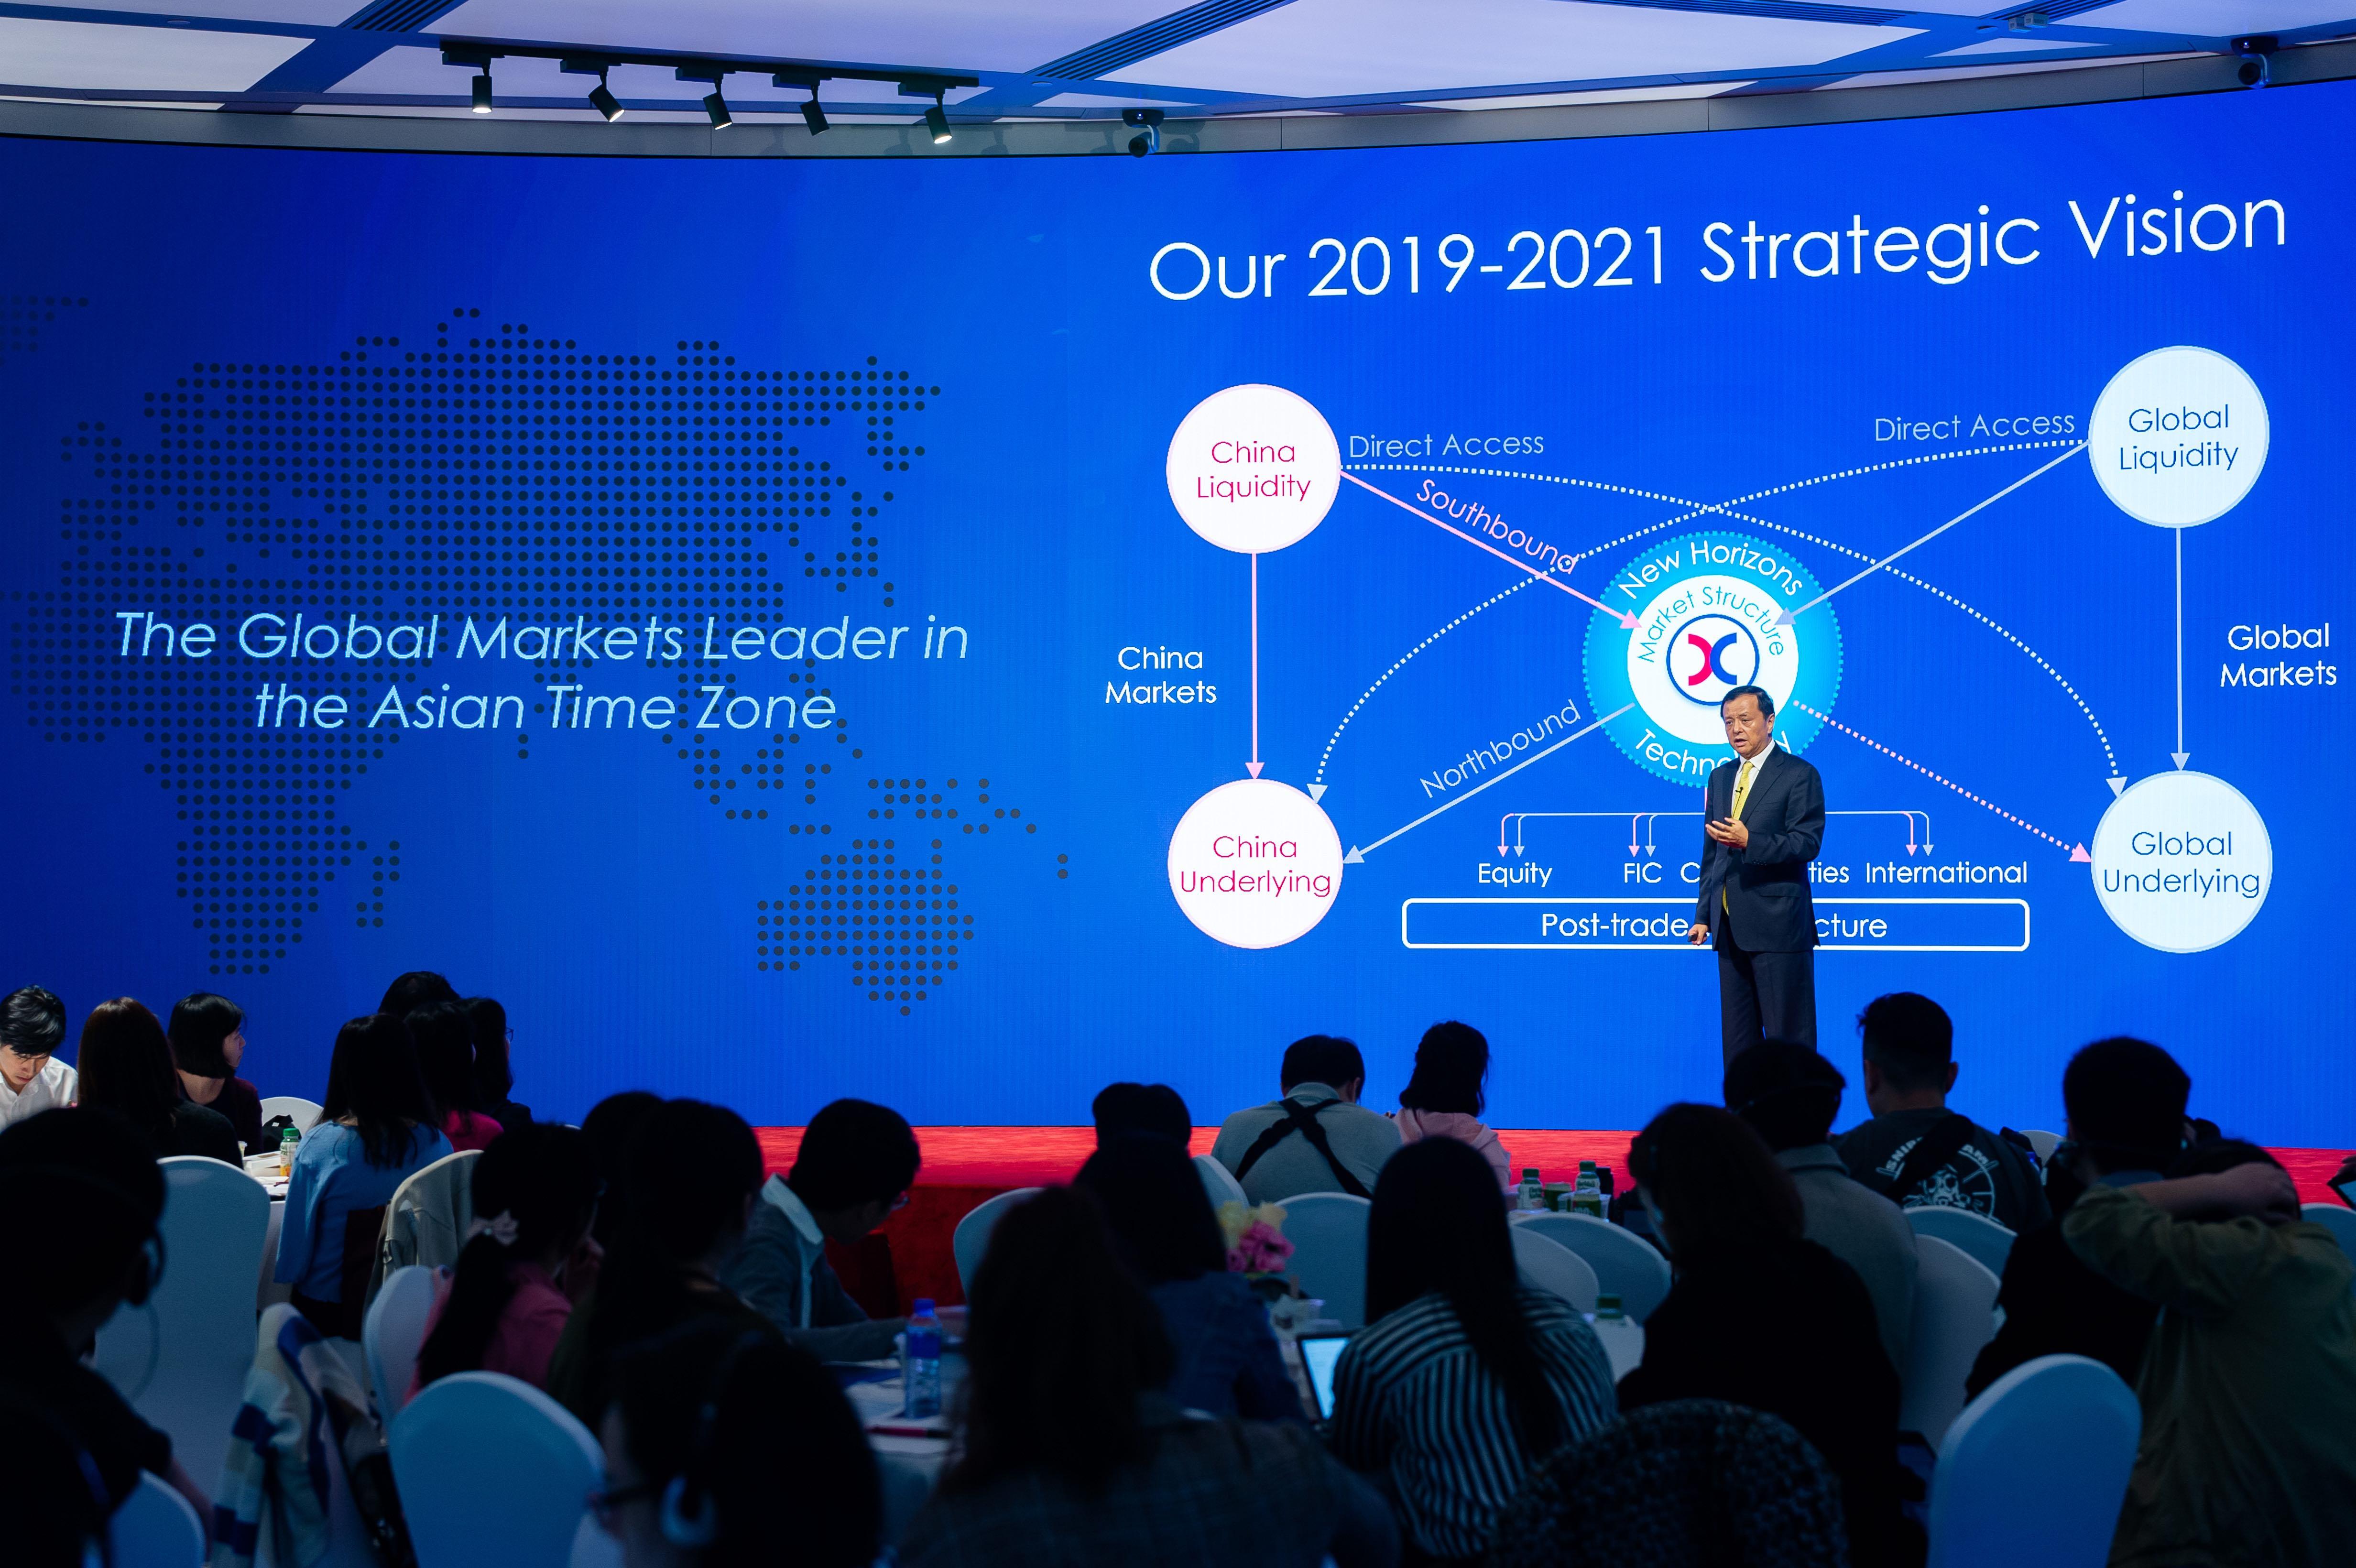 HKEX Strategic Plan 2019-2021